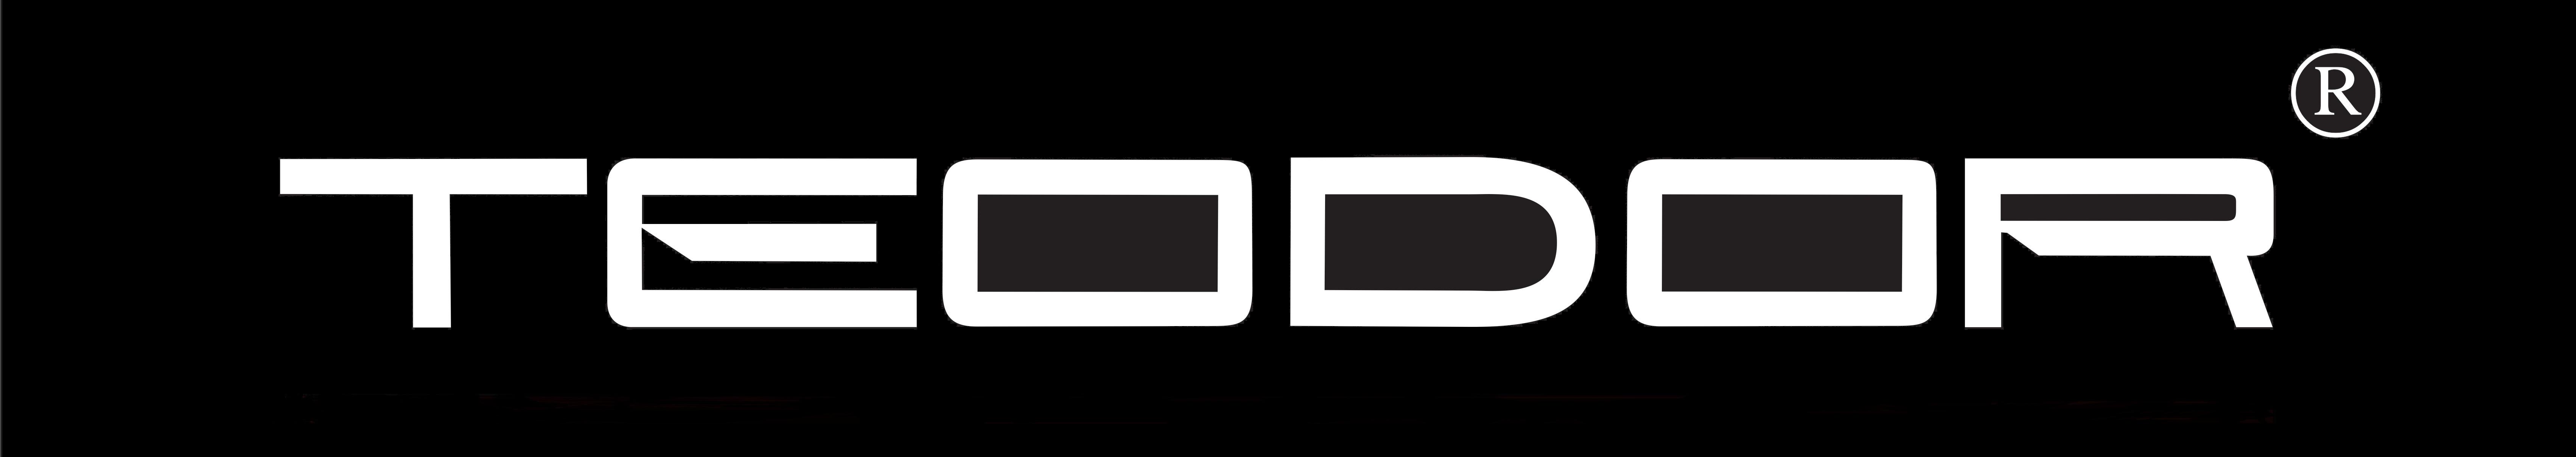 TEODOR_logo